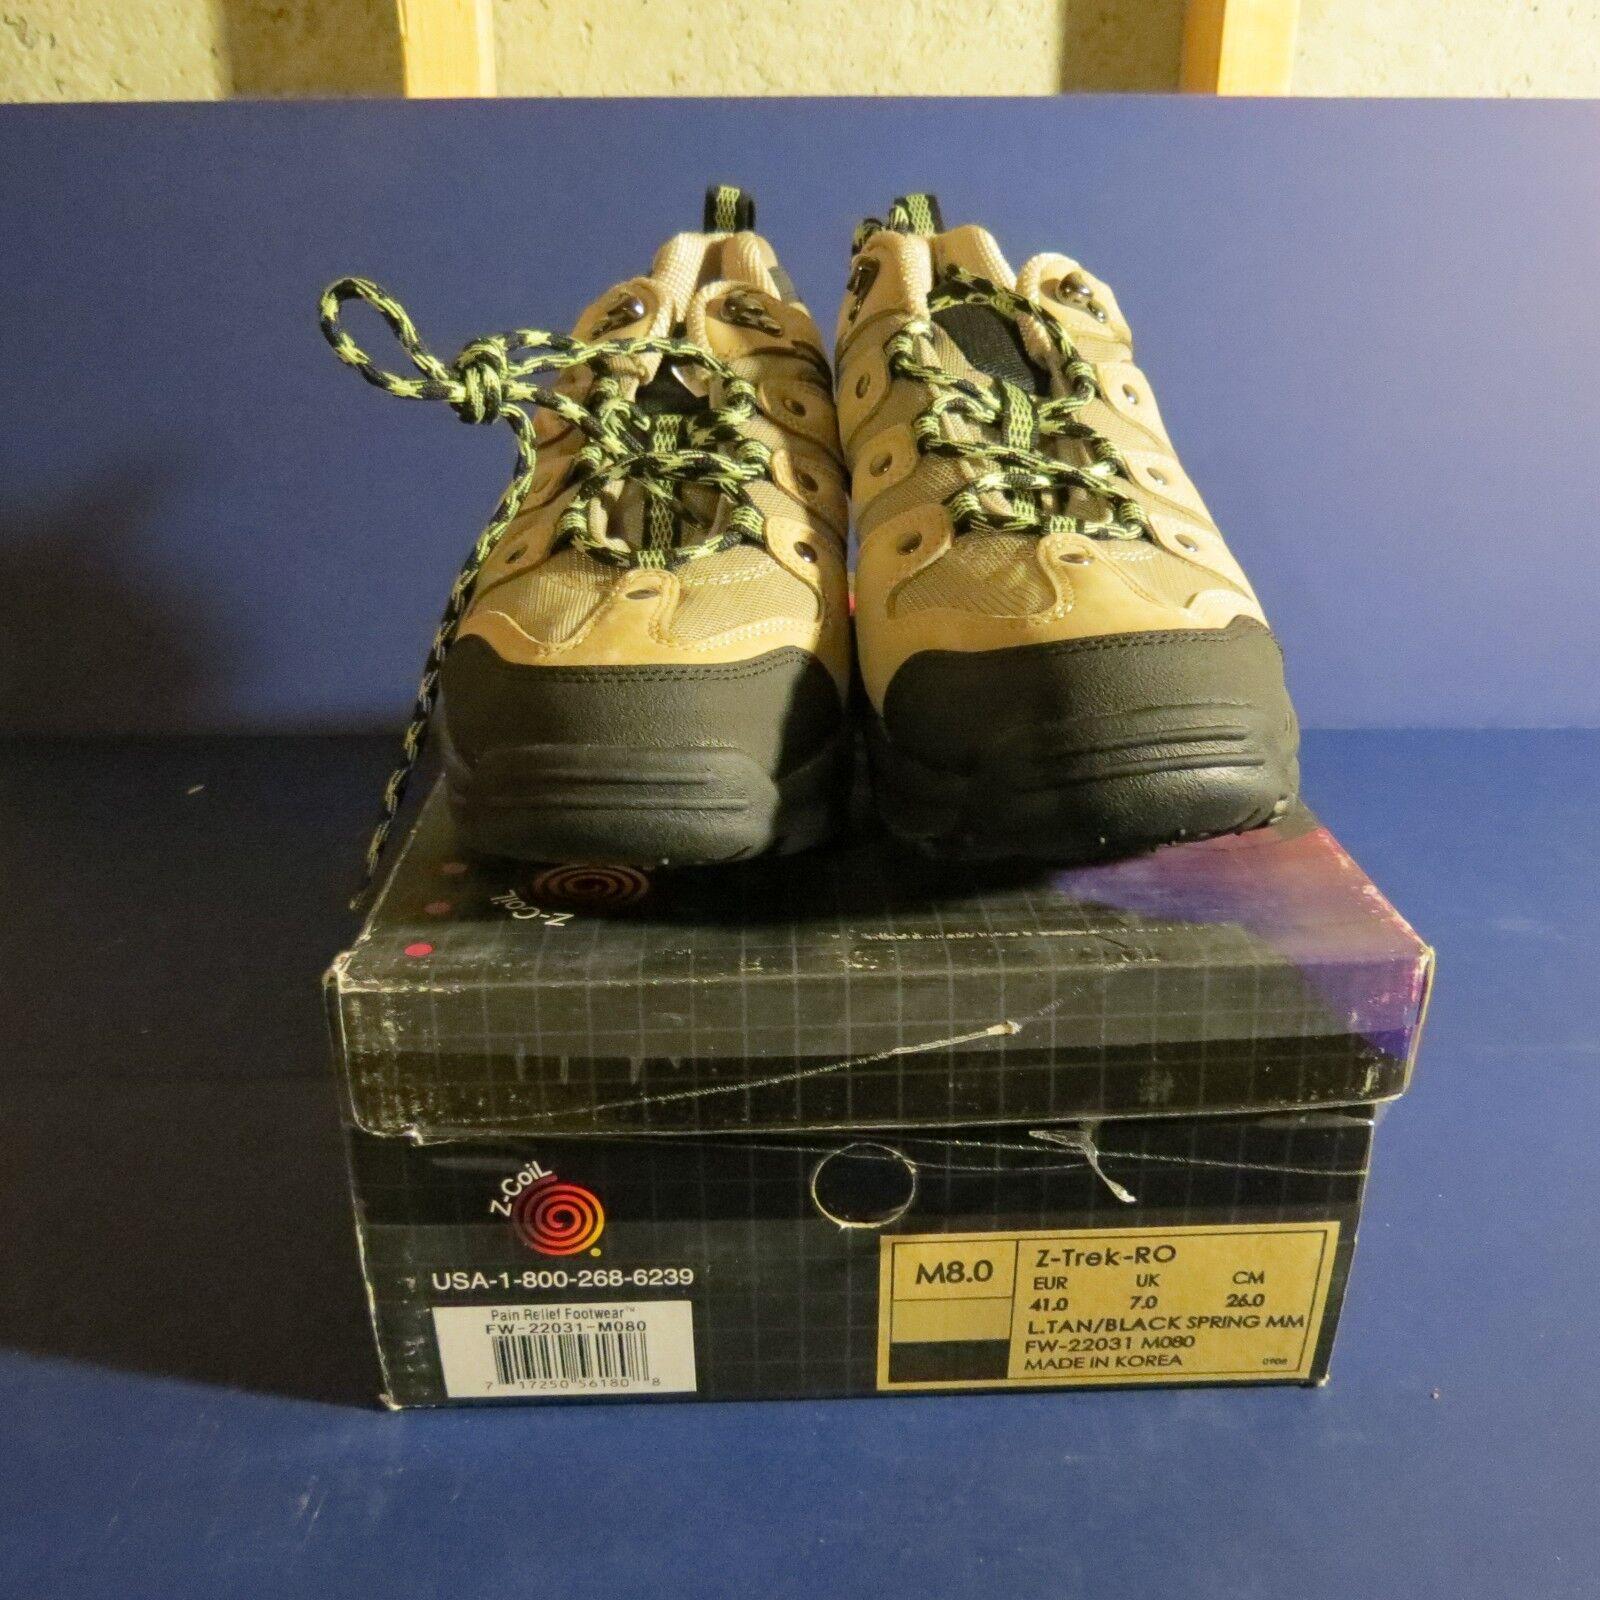 NEW Z-coil pain relief relief relief footwear mens 8 damen 9.5 tan z-trek tan Farbe vintage 365c2c